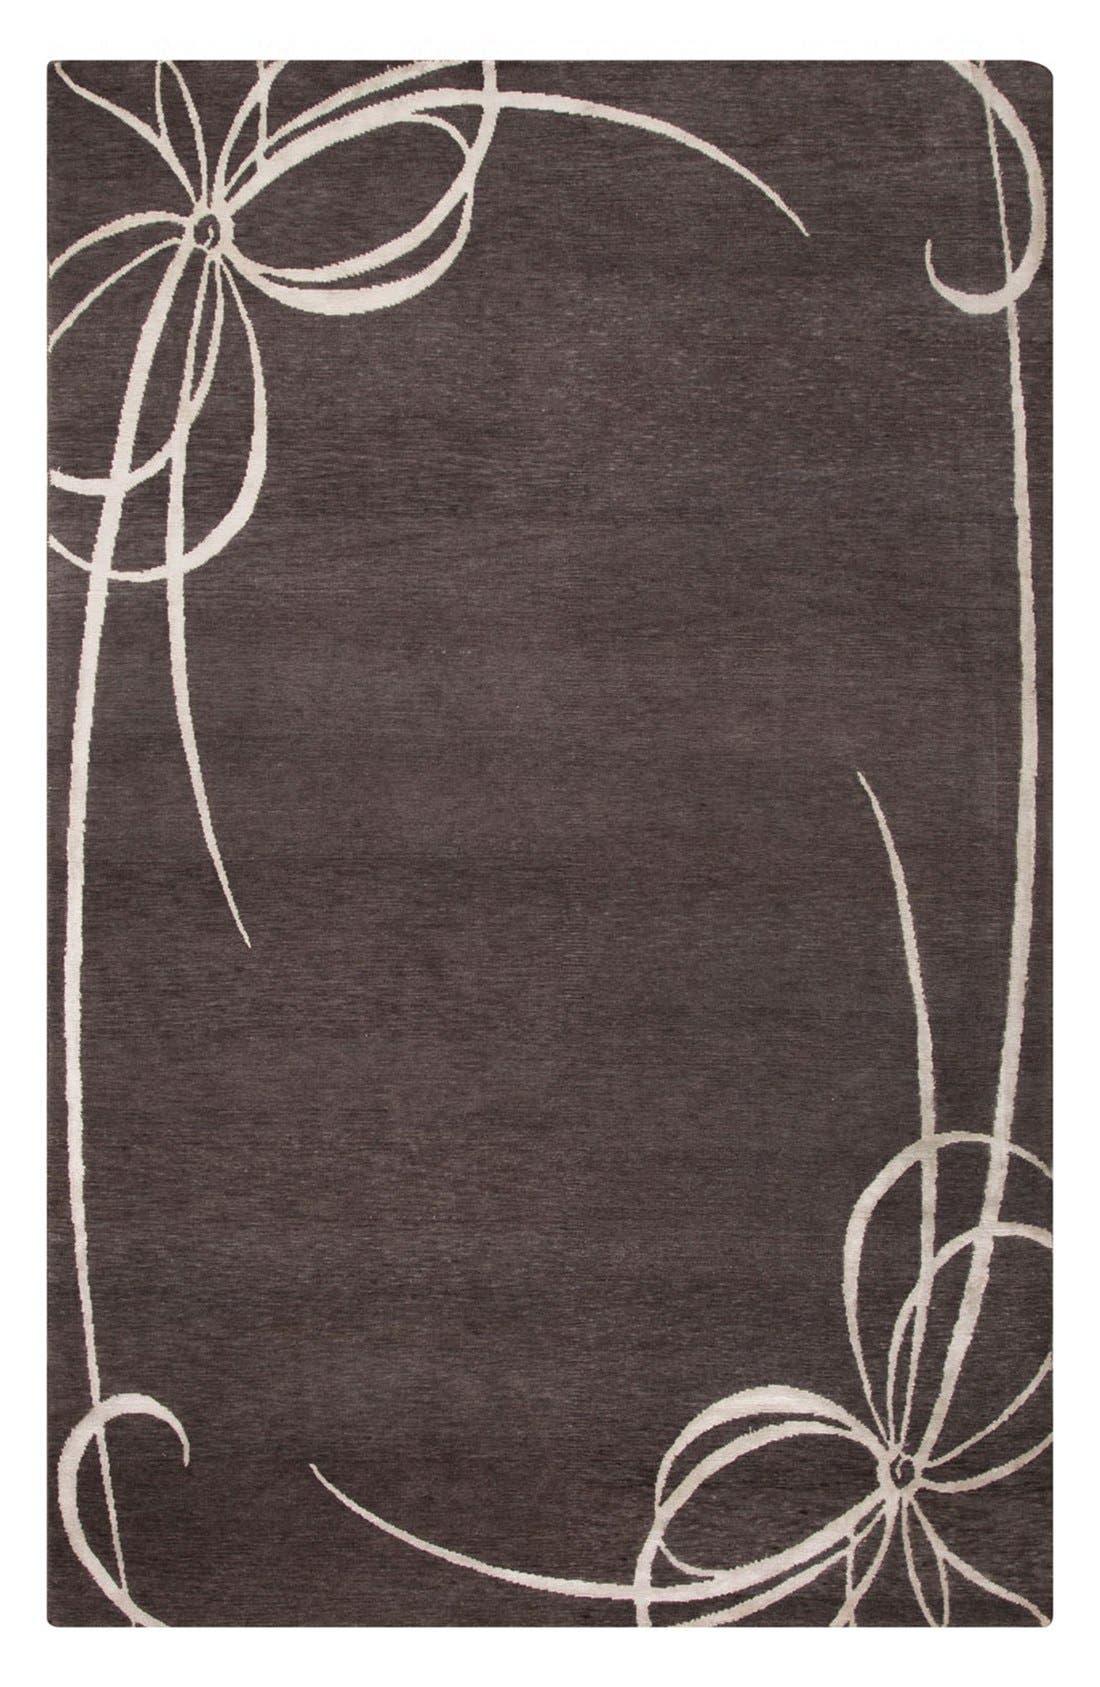 'noho' rug,                         Main,                         color, Grey/ Ivory